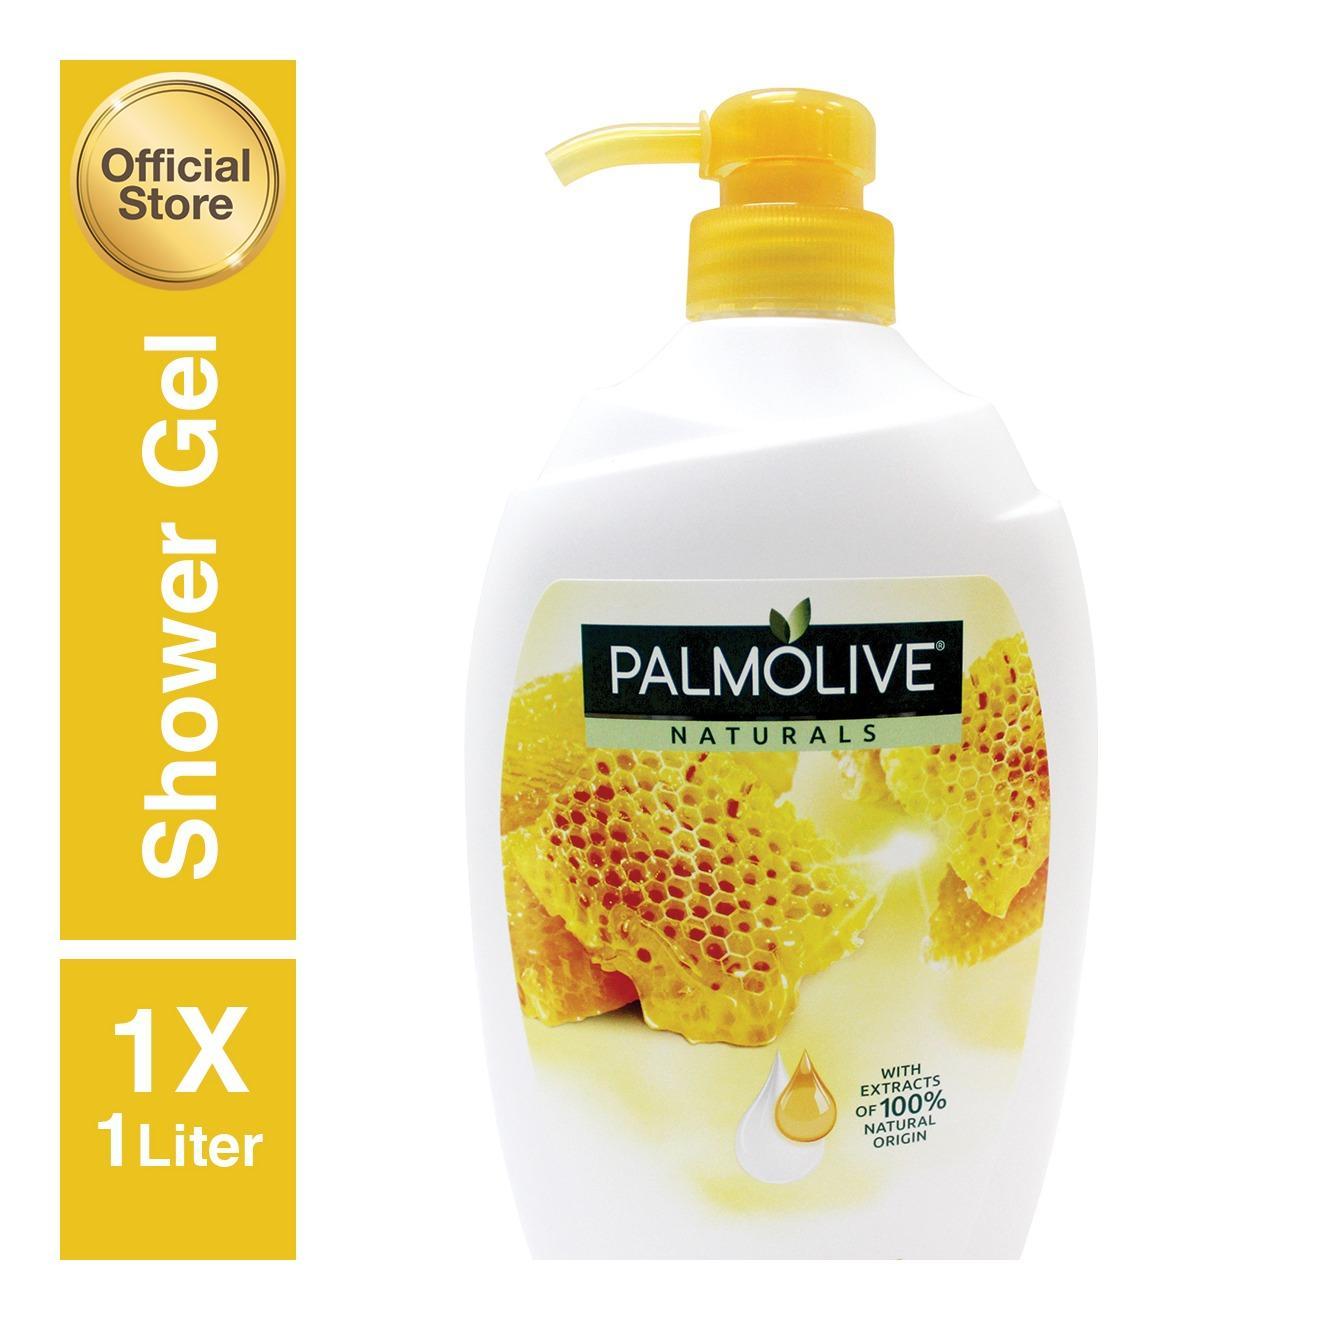 Cek Harga Baru Milk Honey Gold Terkini Situs Pembanding Sabut Mandi Bulat 50gr Palmolive Naturals And Shower Sabun Susu 1l